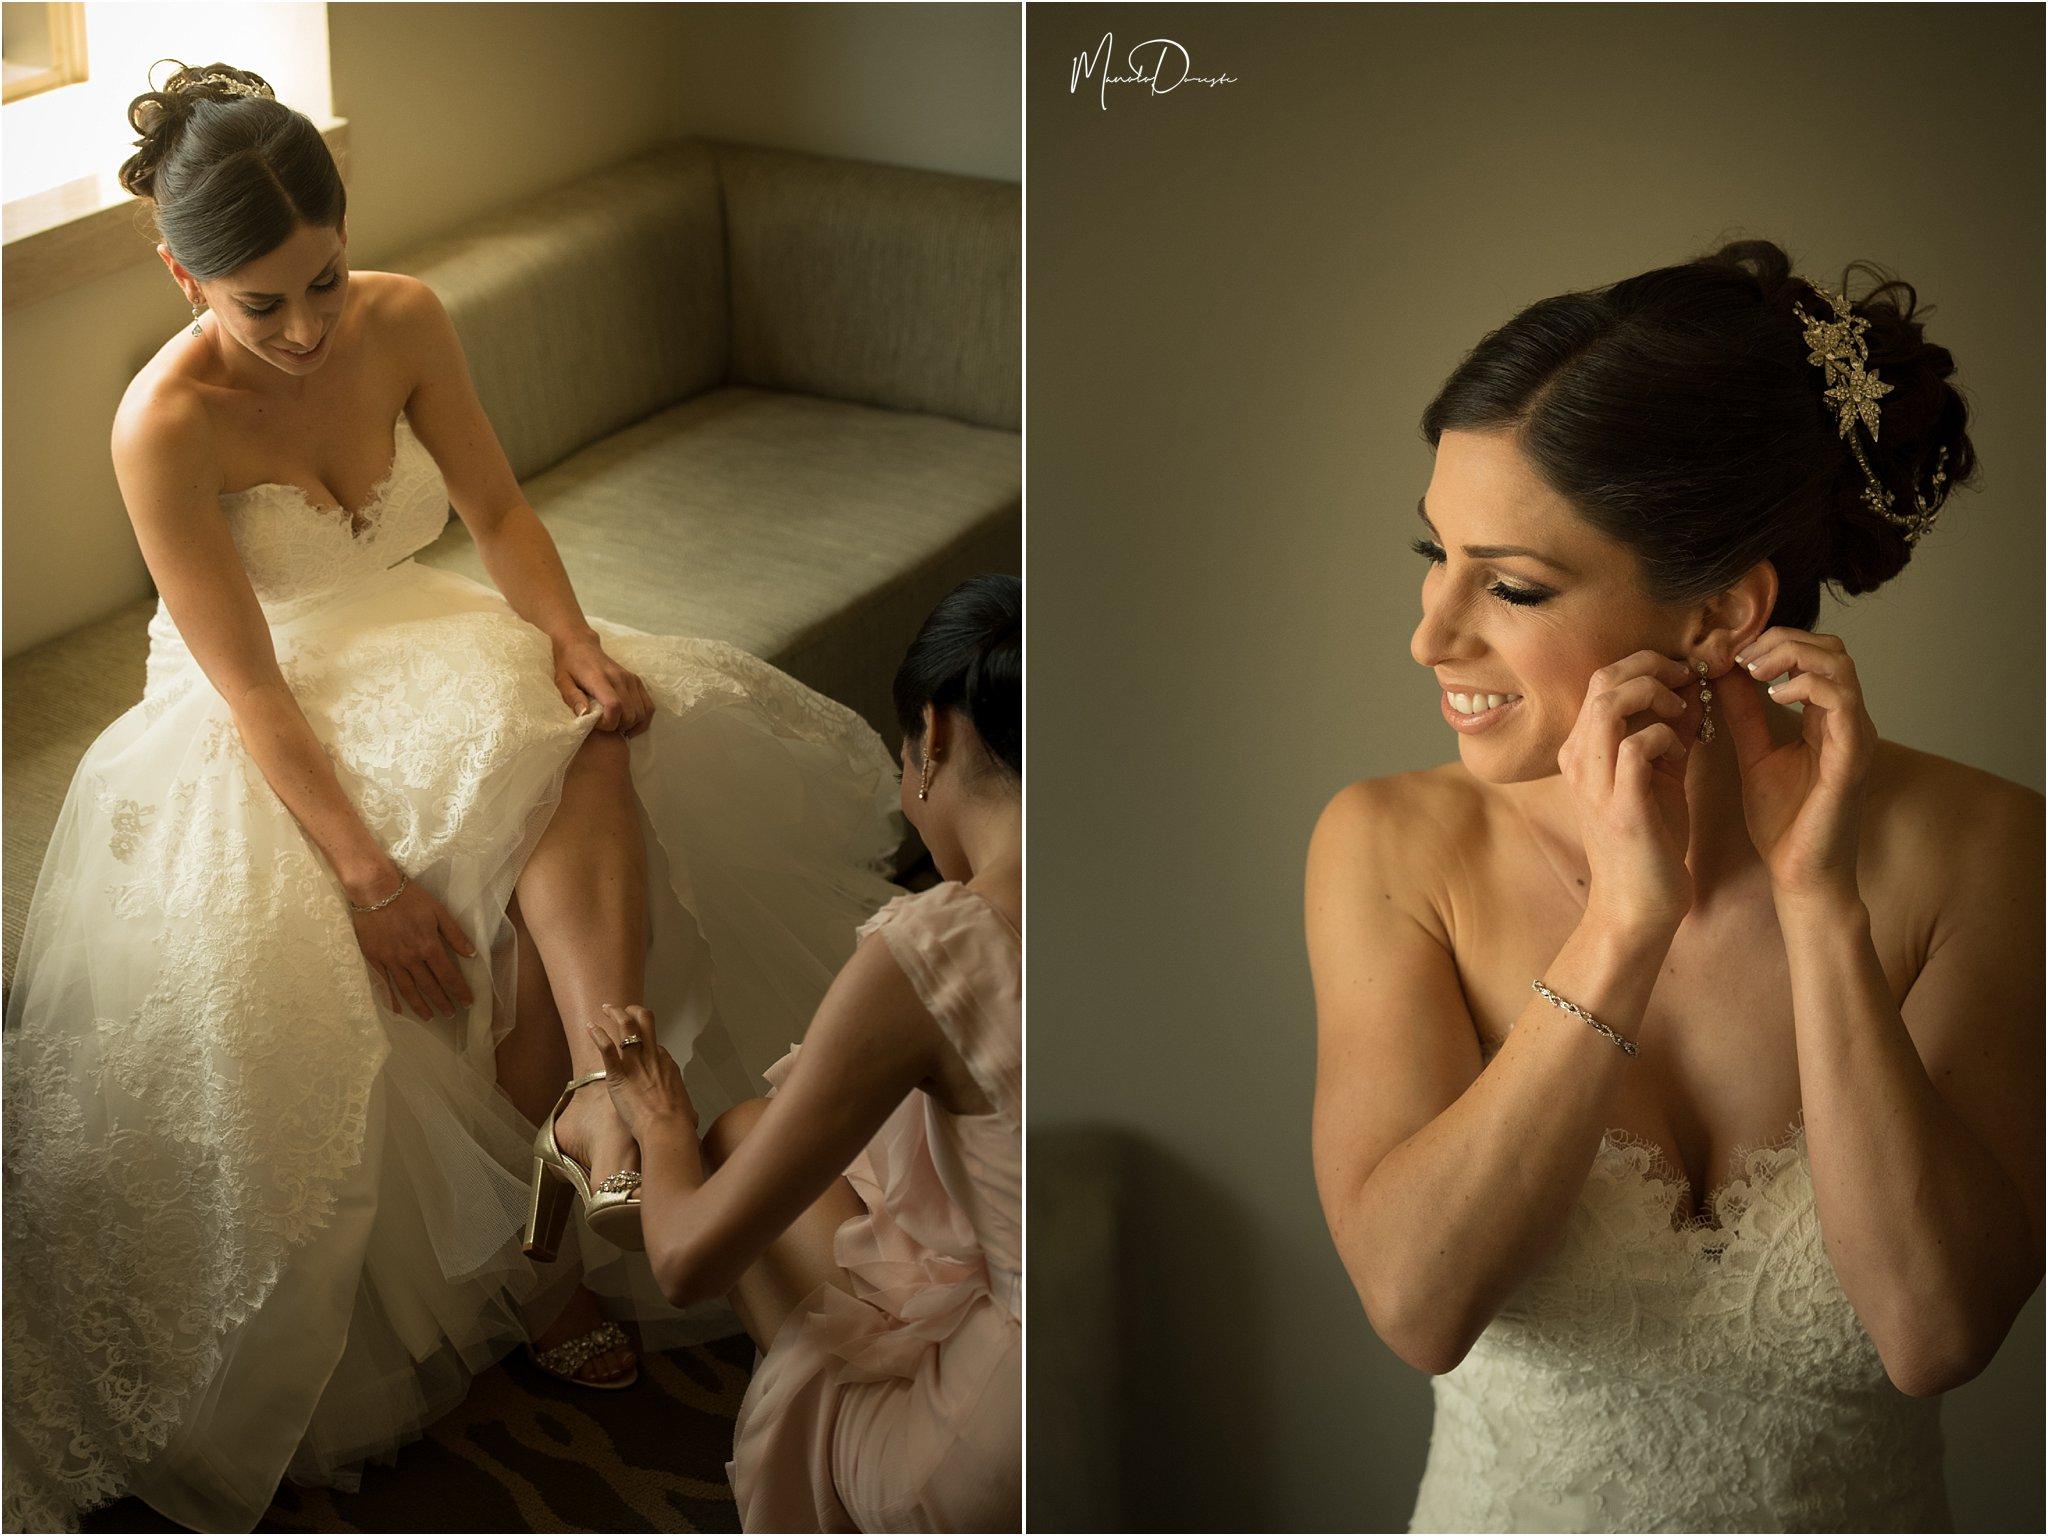 00748_ManoloDoreste_InFocusStudios_Wedding_Family_Photography_Miami_MiamiPhotographer.jpg